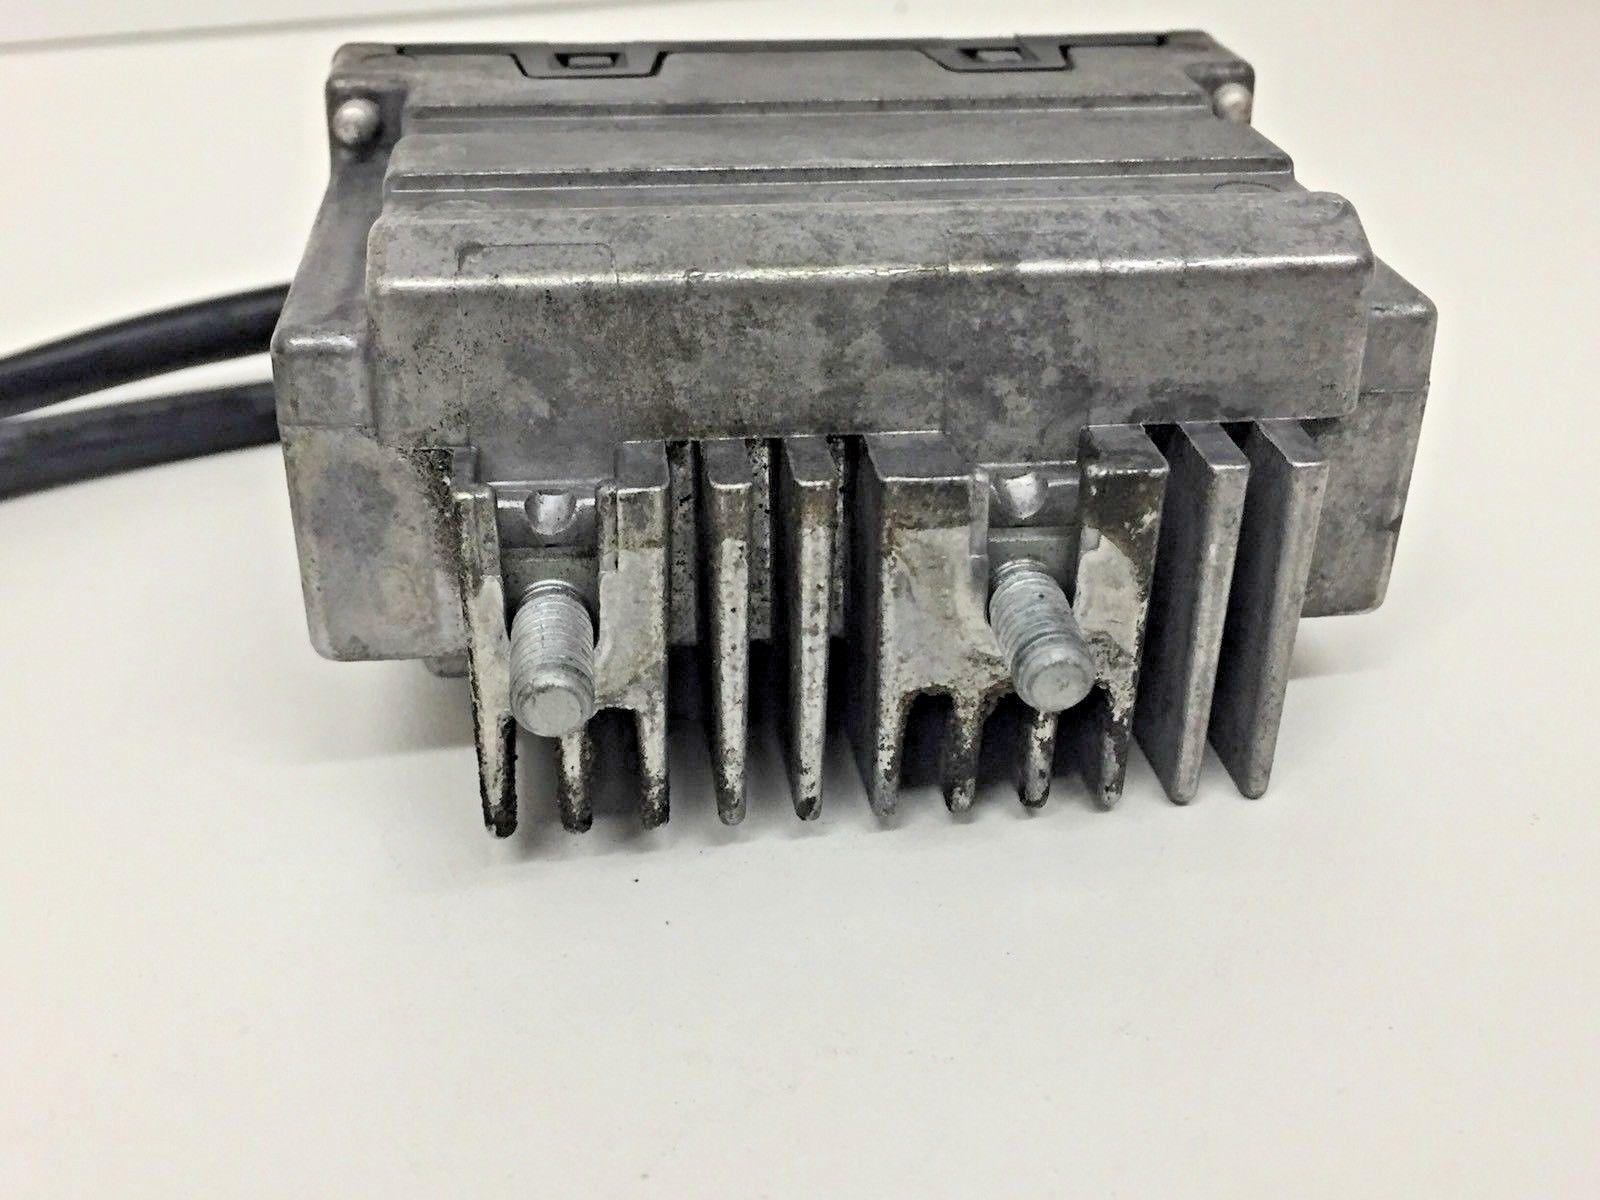 2000 2001 Audi A6 27l Bi Turbo Electric Cooling Fan Control Module 2003 Kia Sedona Electrical Troubleshooting Manual Original Turbocharged